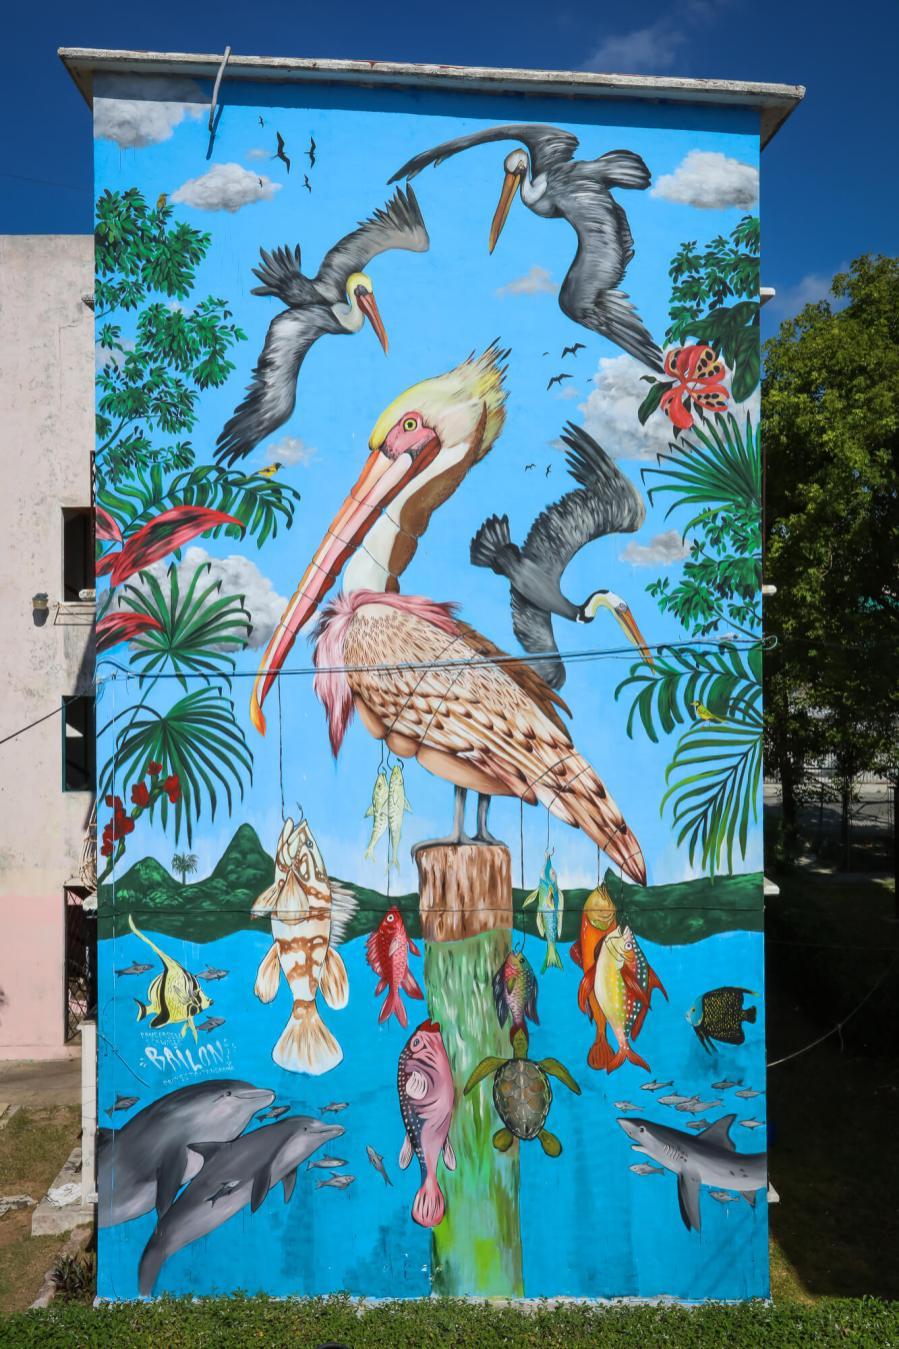 Mateus Bailon, Sea Walls: Artists for Oceans Street art festival Cancun, Mexico 2017. Photo Credit Tre' Packard.